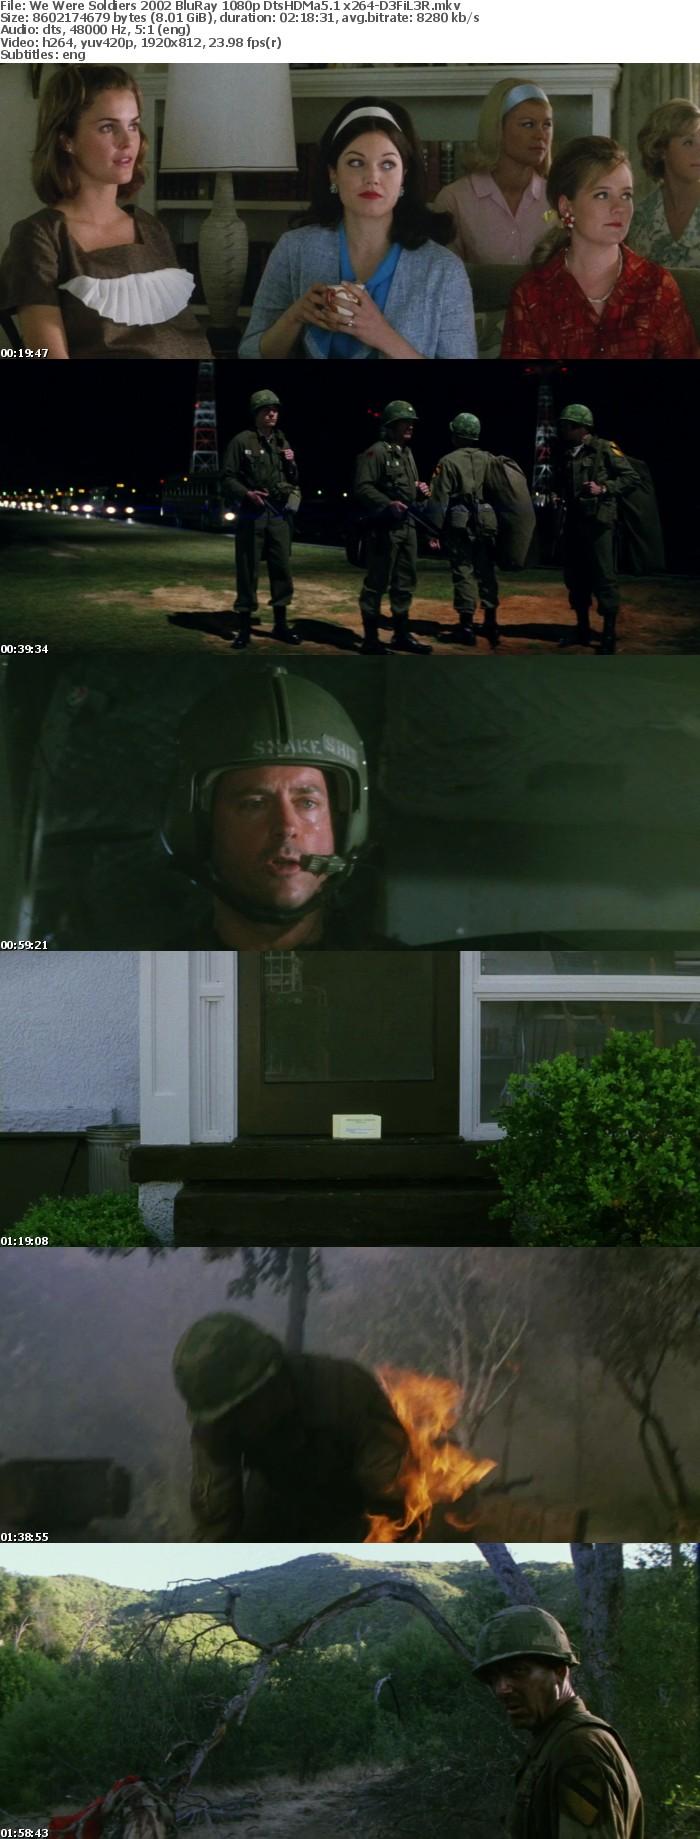 We Were Soldiers 2002 BluRay 1080p DtsHDMa6 1 x264-D3FiL3R